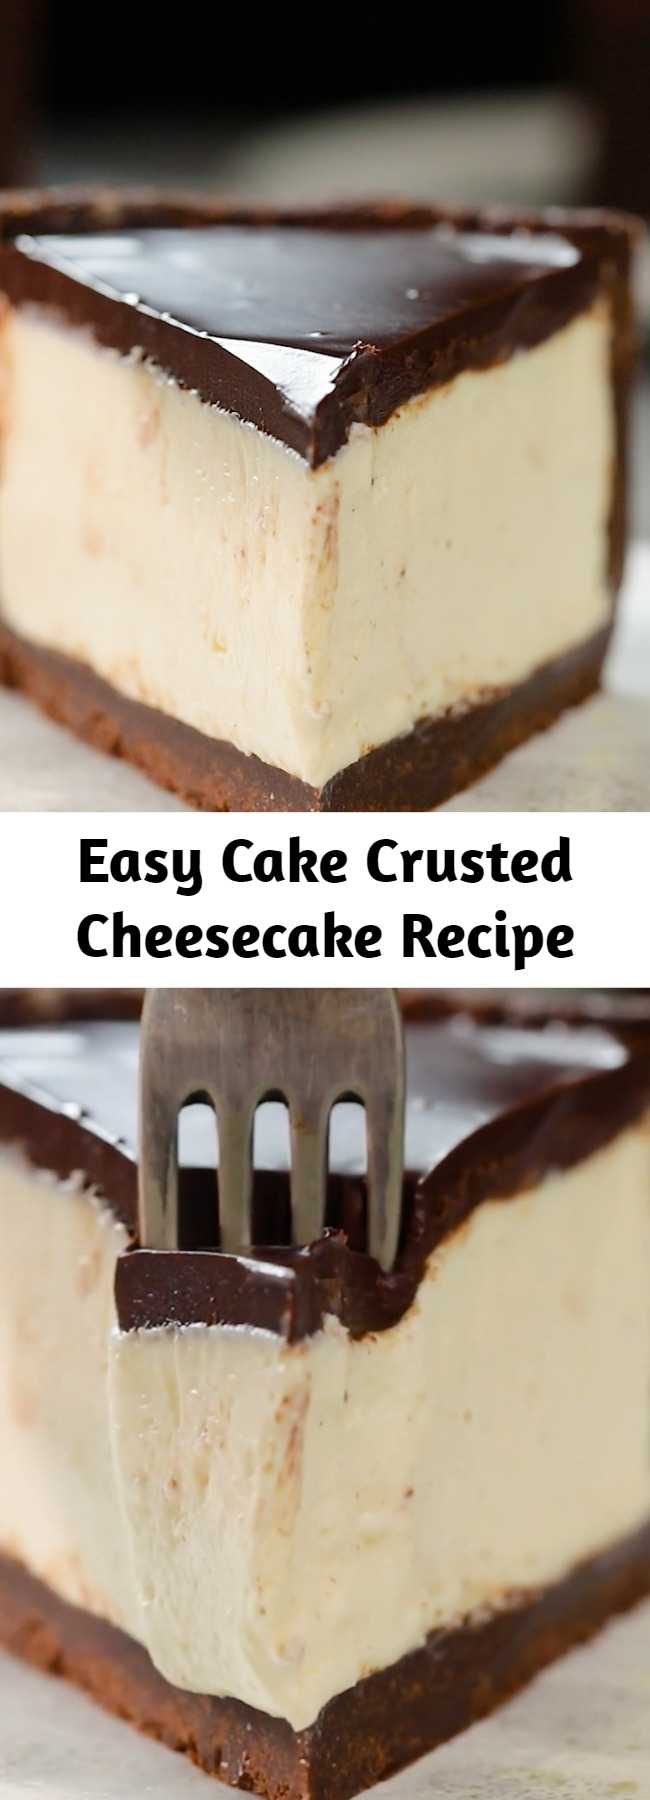 Easy Cake Crusted Cheesecake Recipe - Cake and Cheesecake all in one!